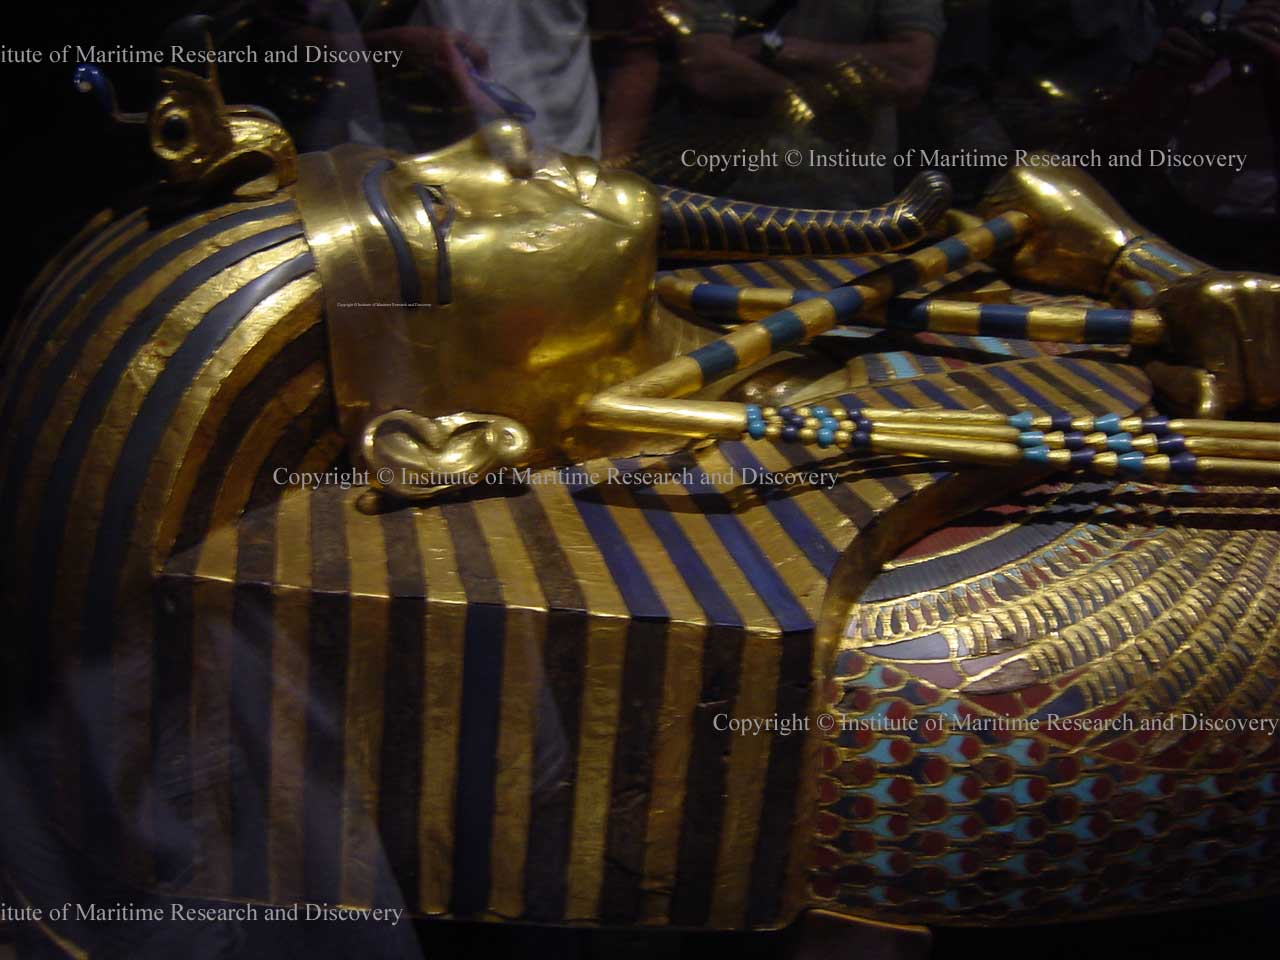 Outter Coffin of King Tutankhamun